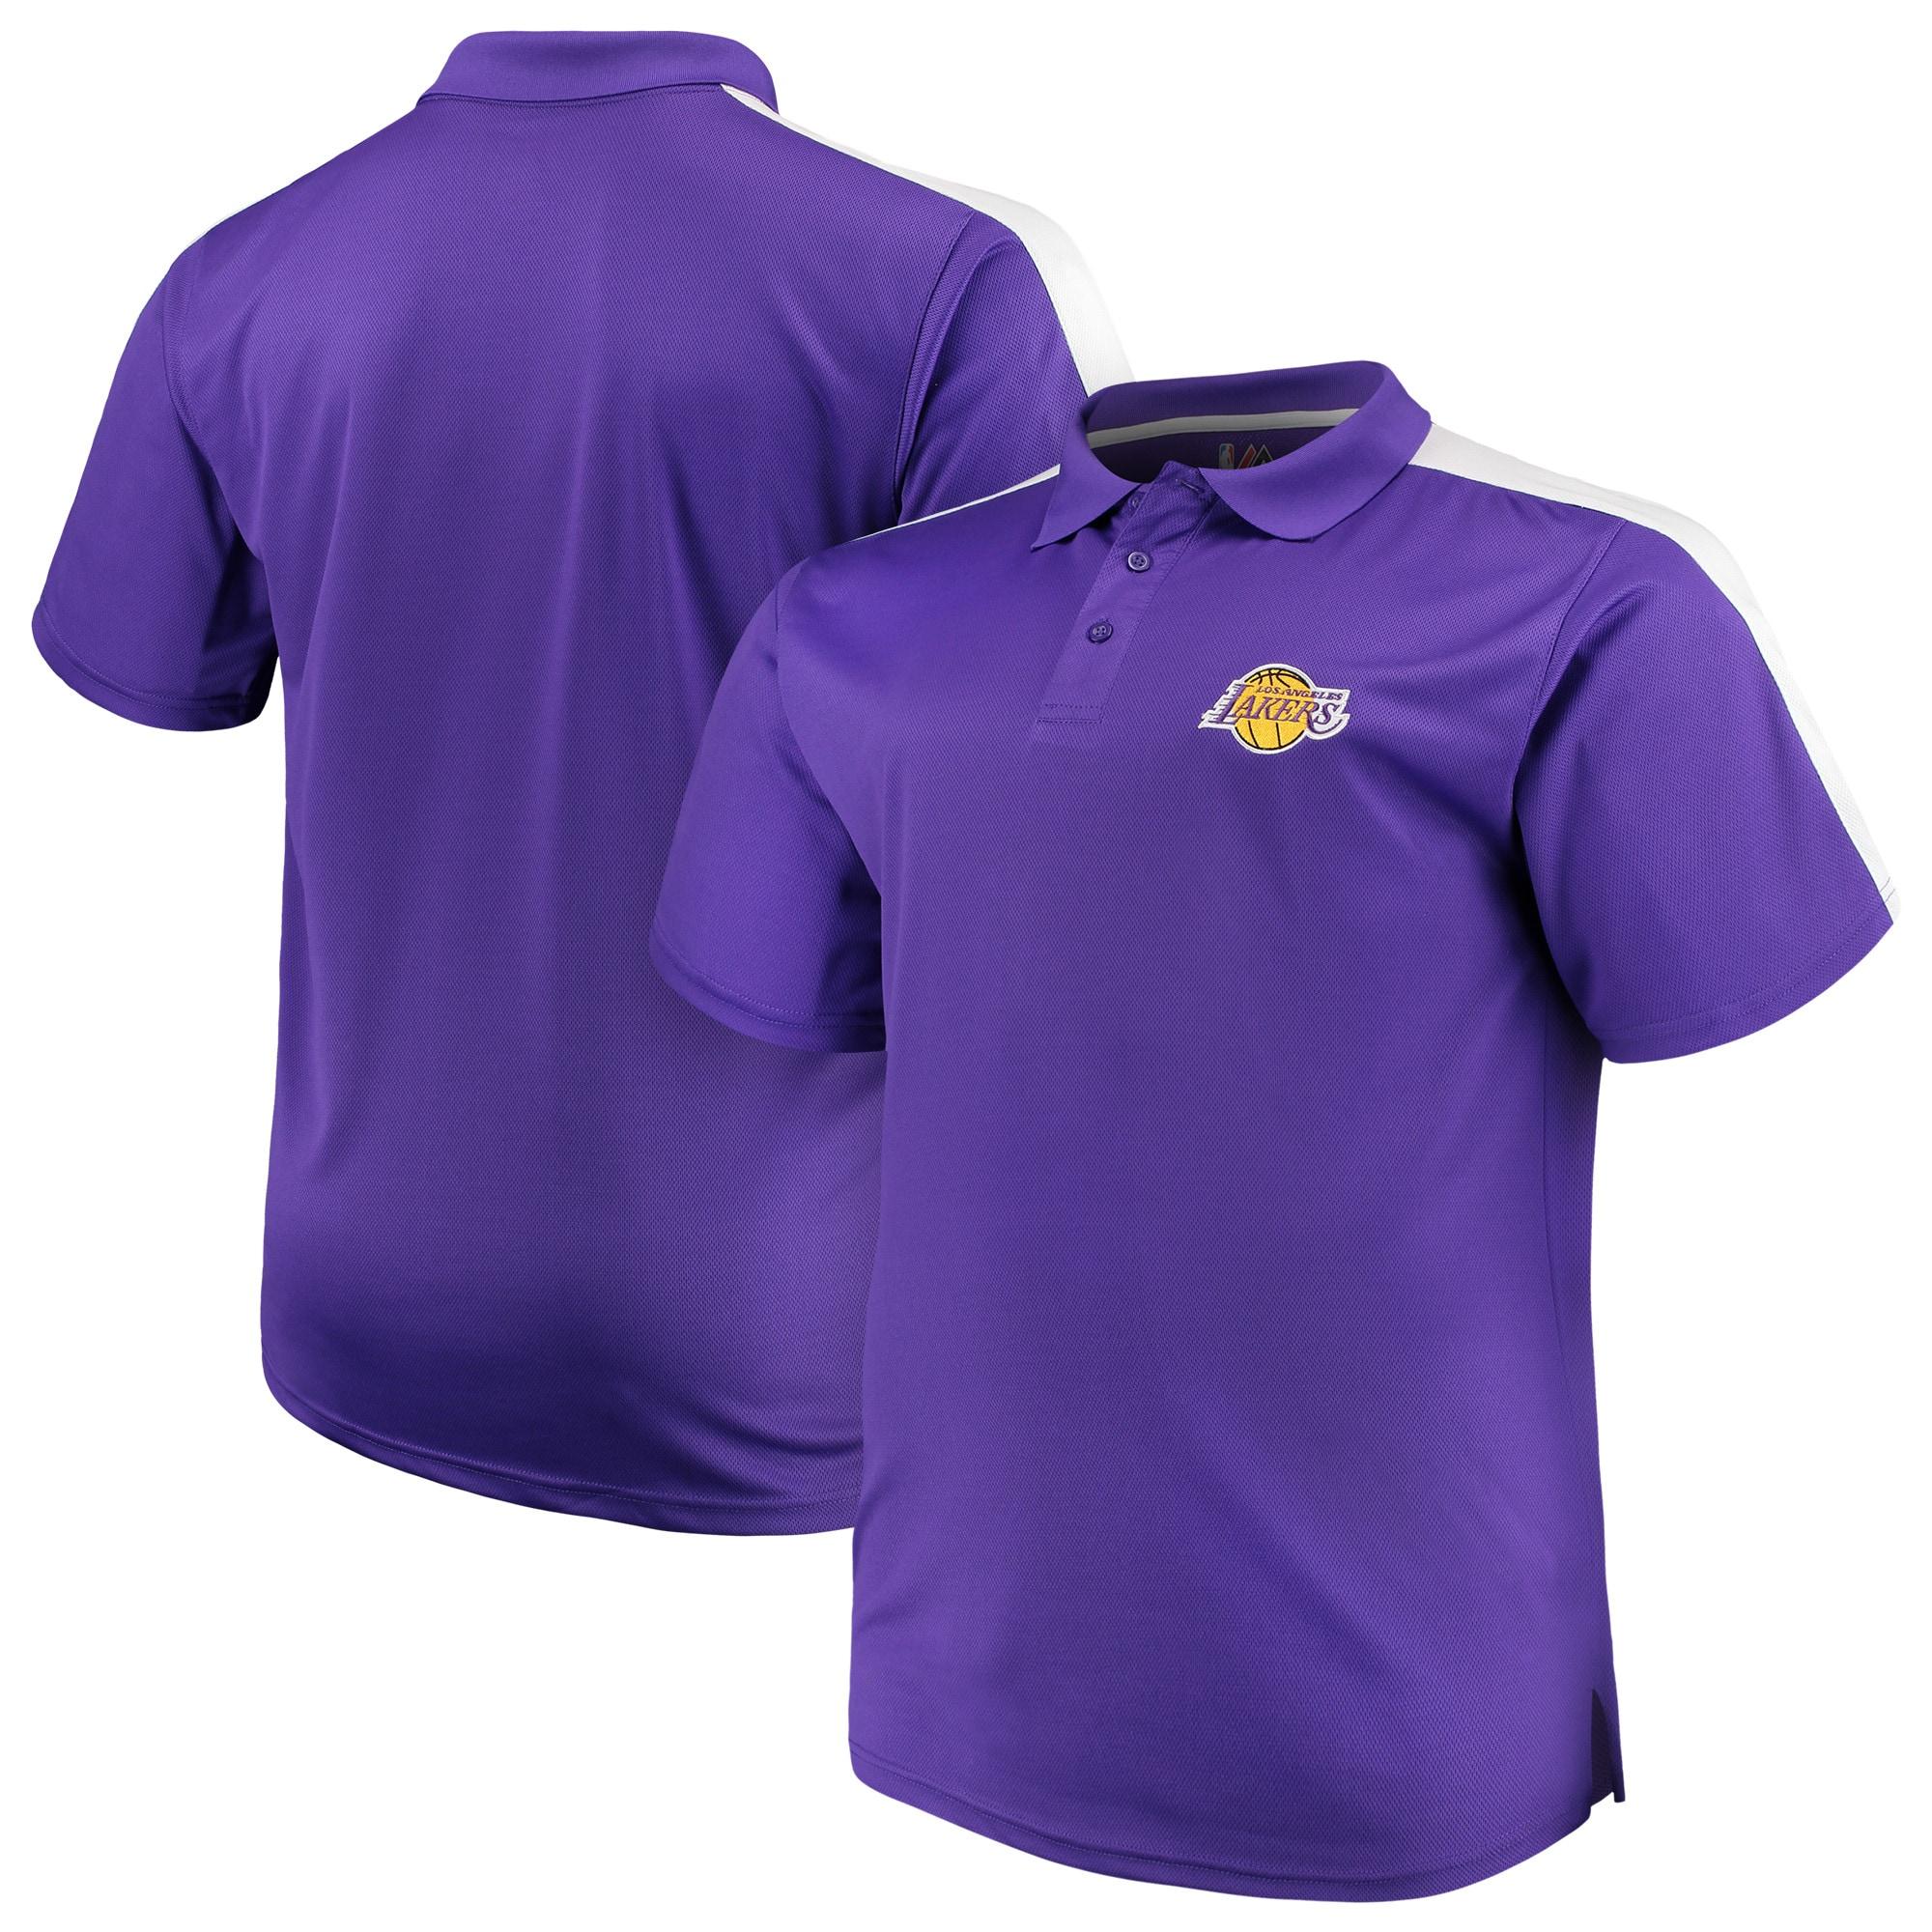 Los Angeles Lakers Majestic Big & Tall Birdseye Polo - Purple/White